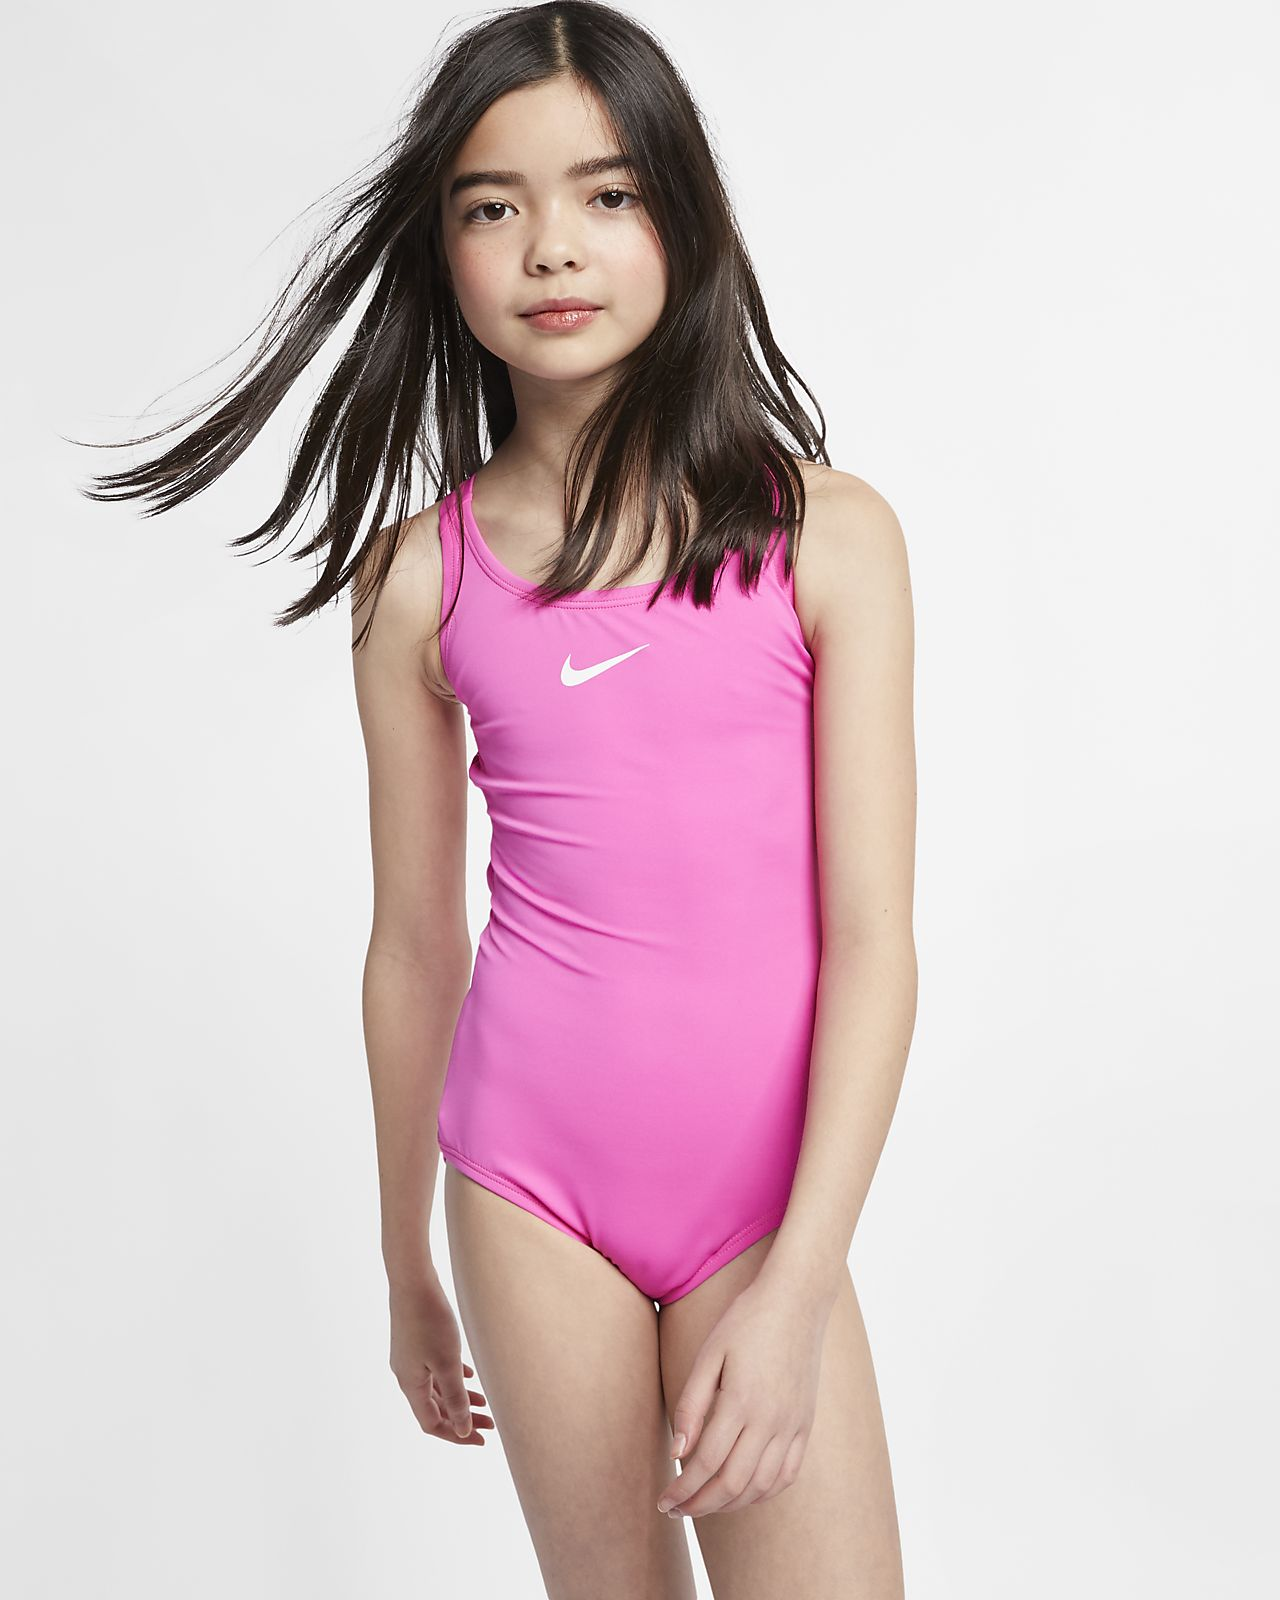 Nike Solid Racerback Big Kids' (Girls') Two-Piece Swimsuit